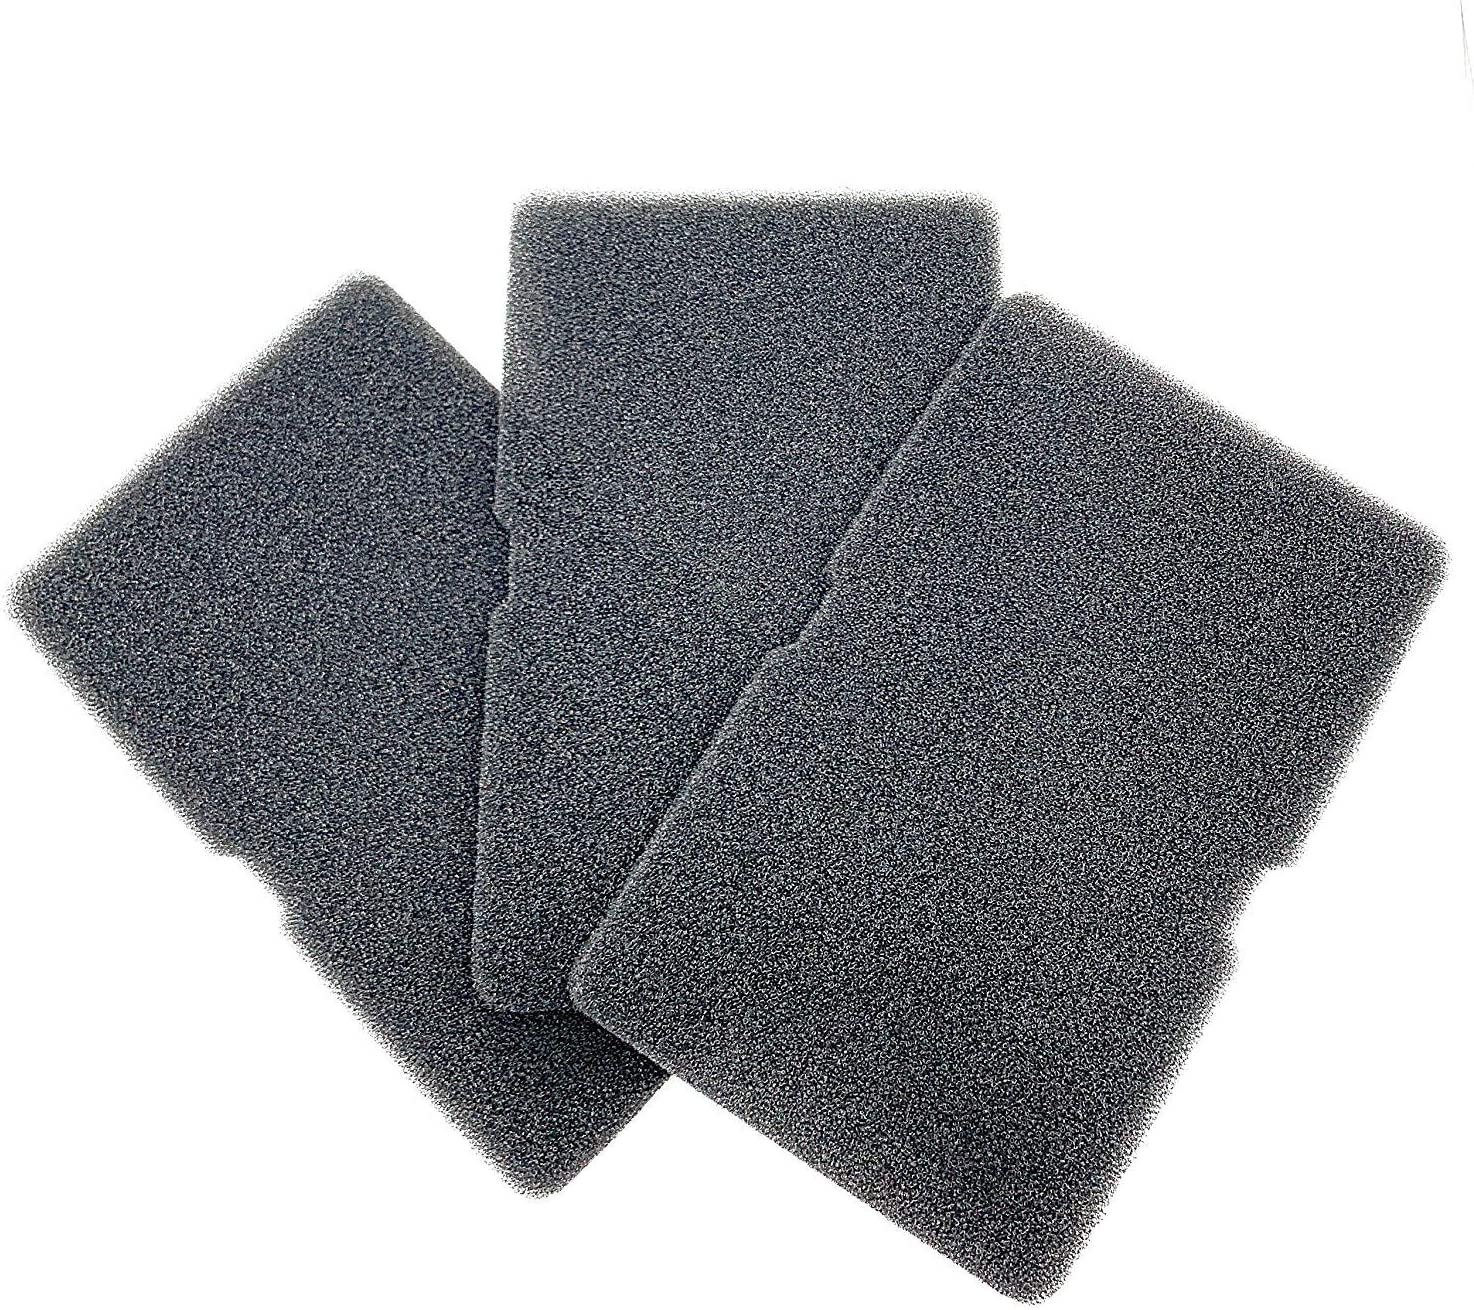 Juego de 3 filtros para secadora de bomba de calor Beko Grundig, filtro de esponja, esterilla de filtro, secador de condensación, filtro de pelusa, filtro de pelusa 2964840100